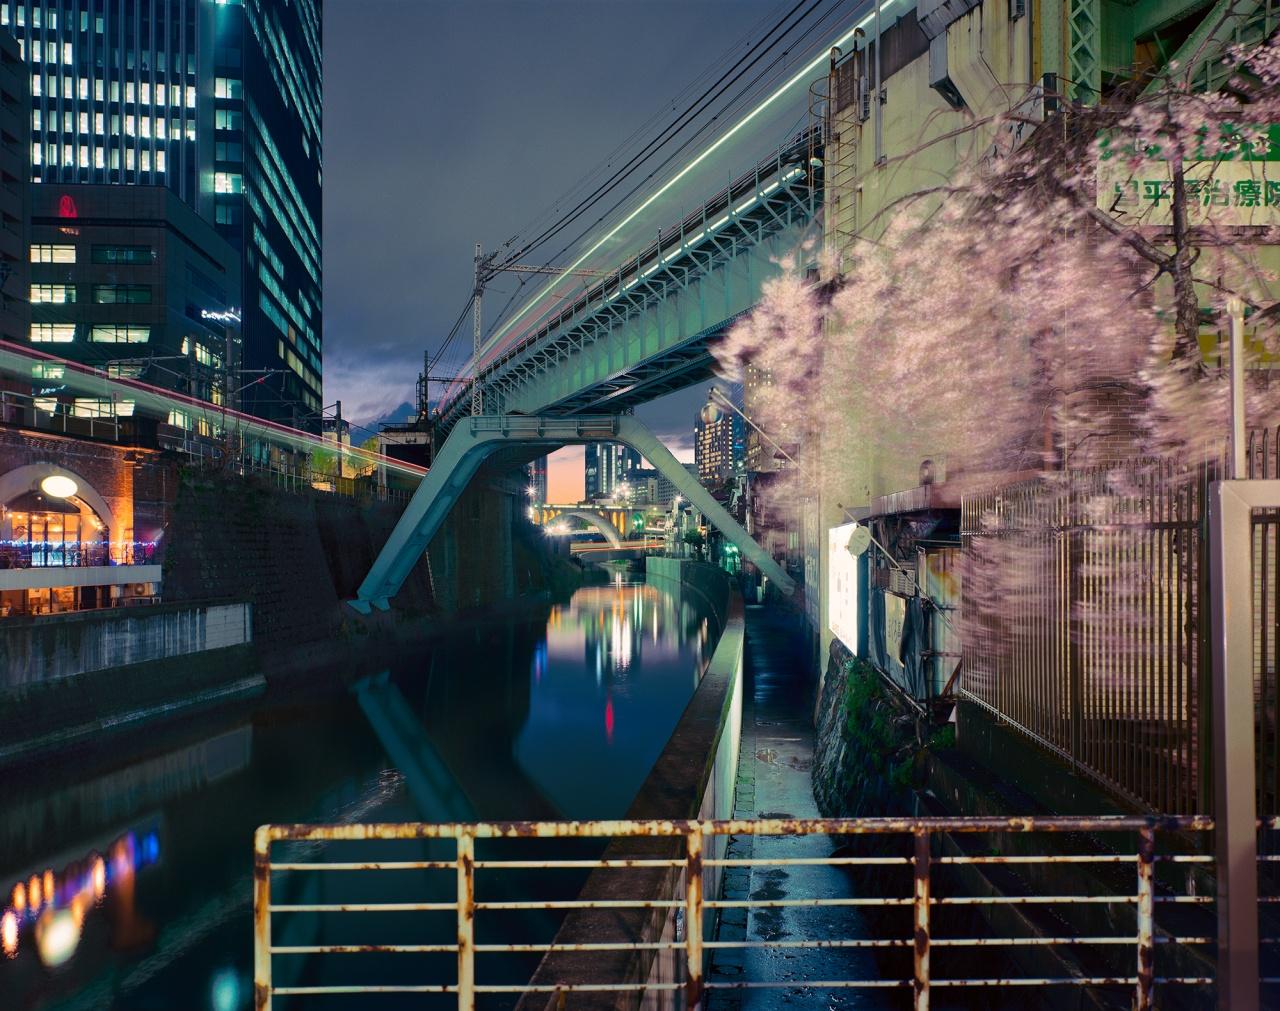 Kanda river, Tokyo